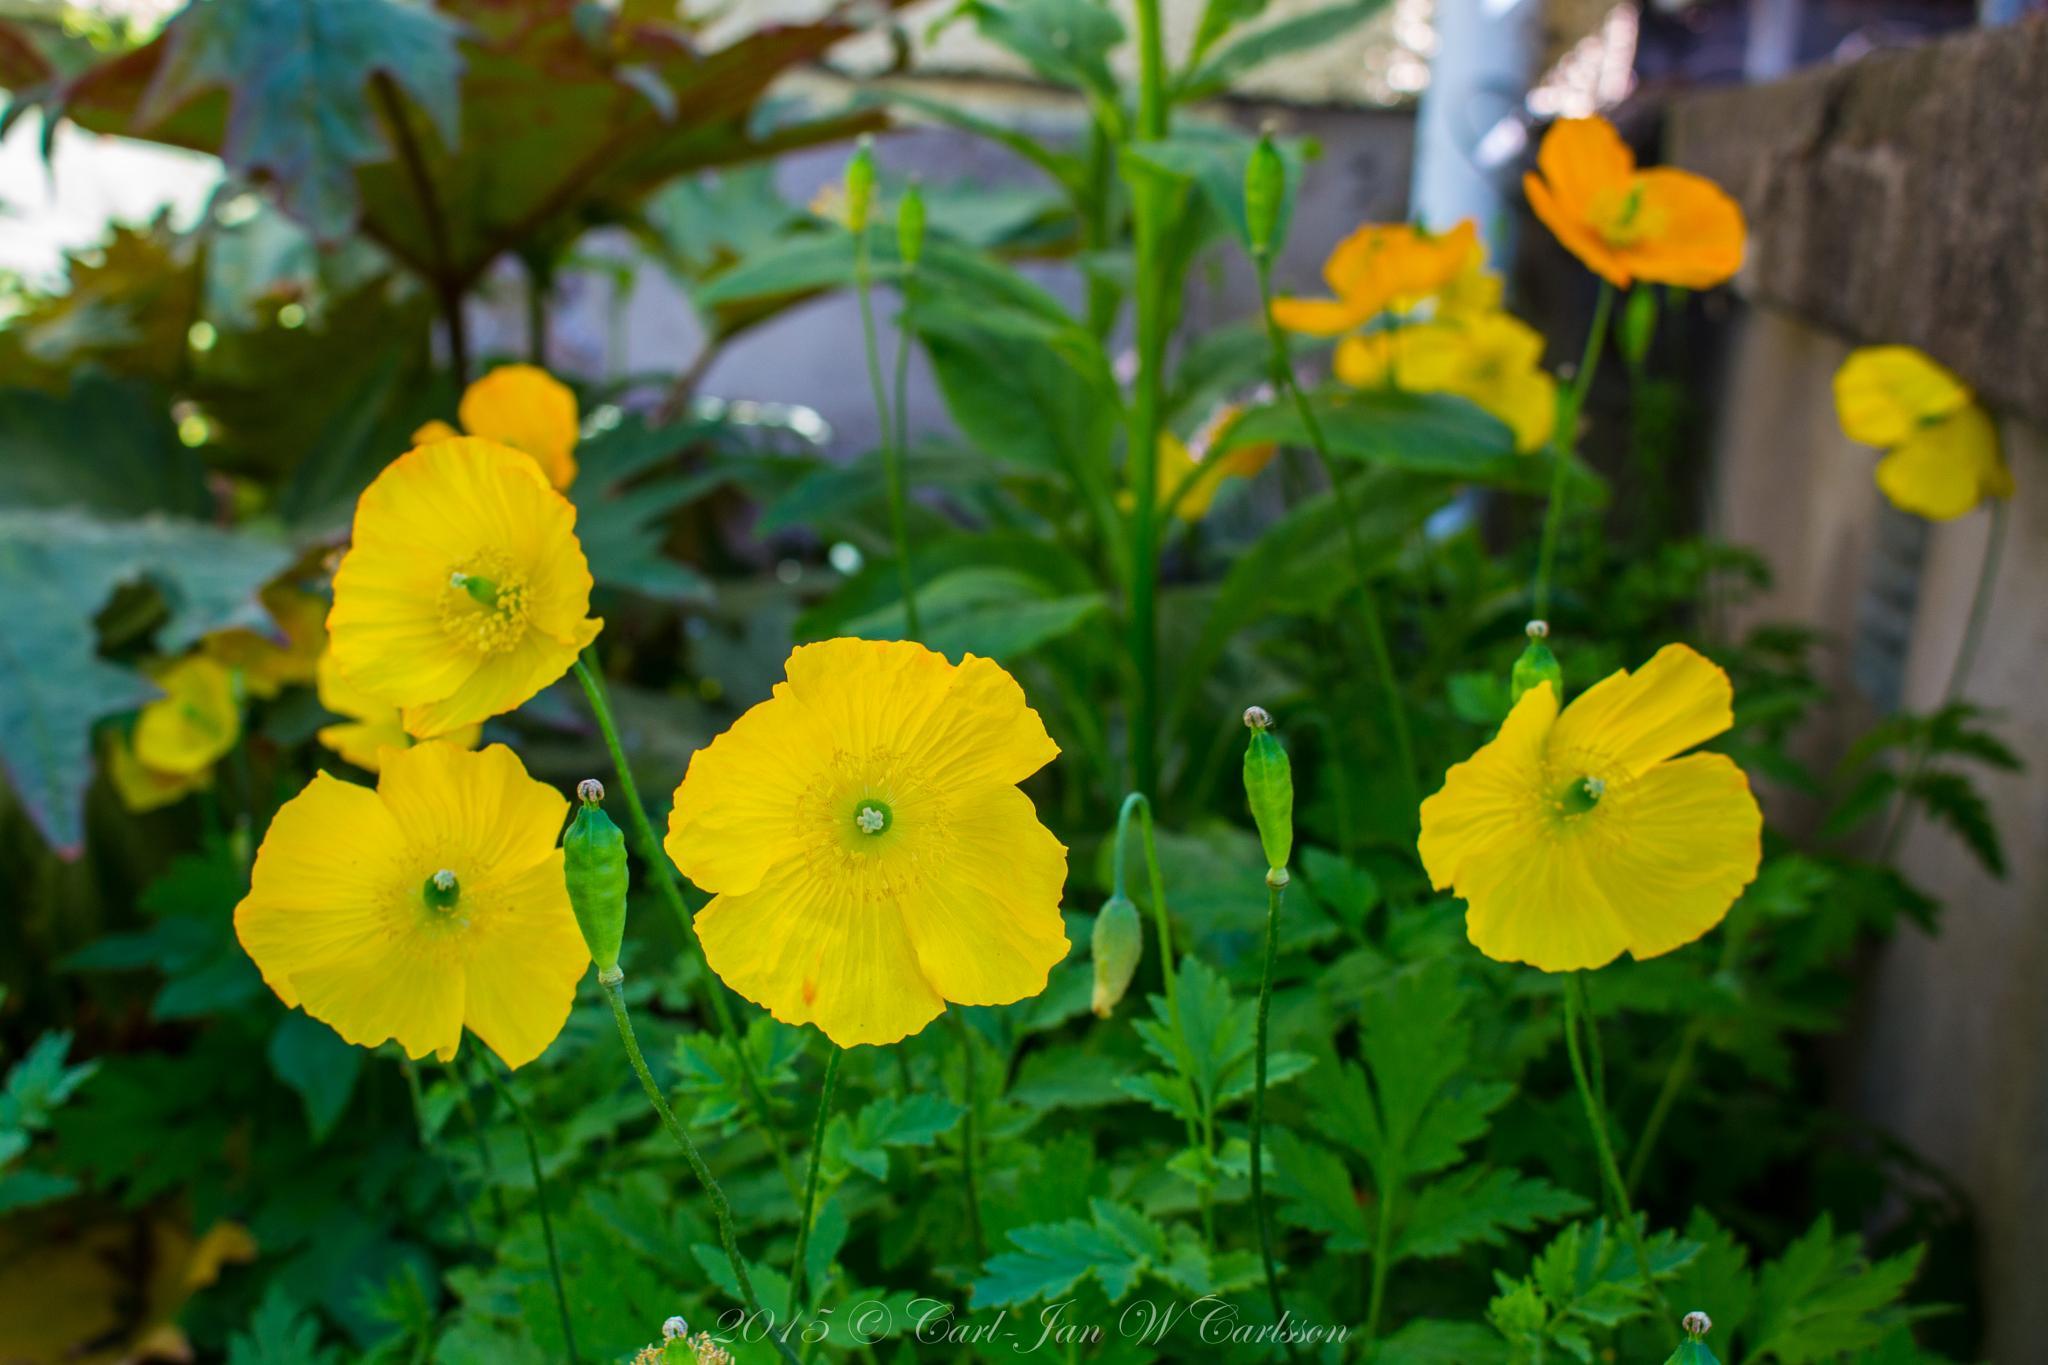 Yellow Poppies by carljan w carlsson